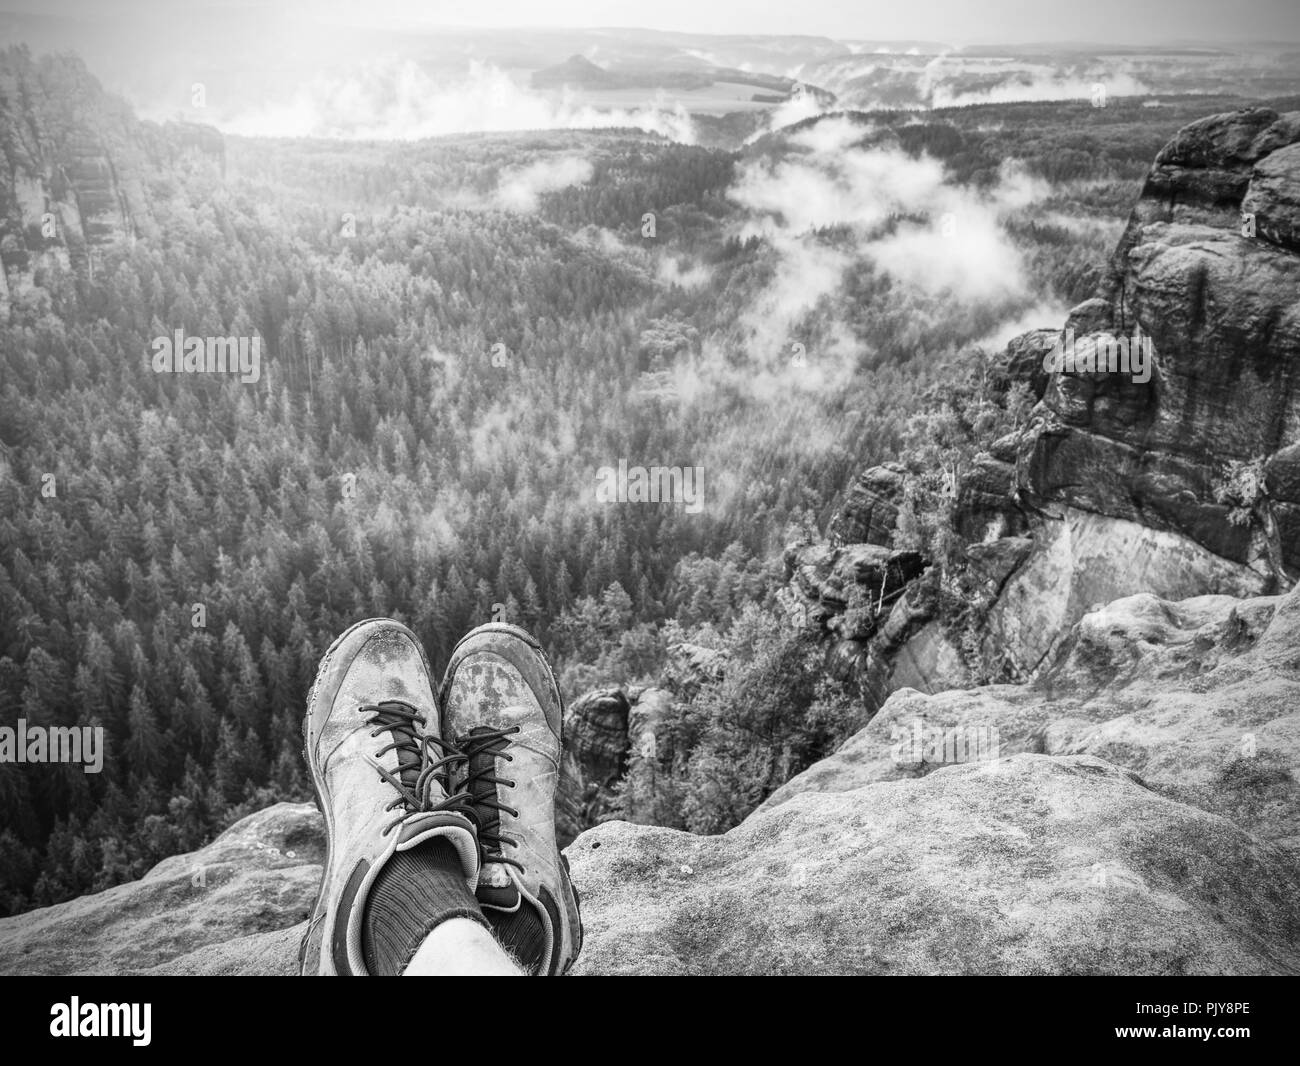 Wandern bequeme Schuhe. All terrain Schuhe. Wanderschuhe auf Wanderer draußen zu Fuß überqueren Rocky traail. Herbst wandern in Natur pur Stockbild